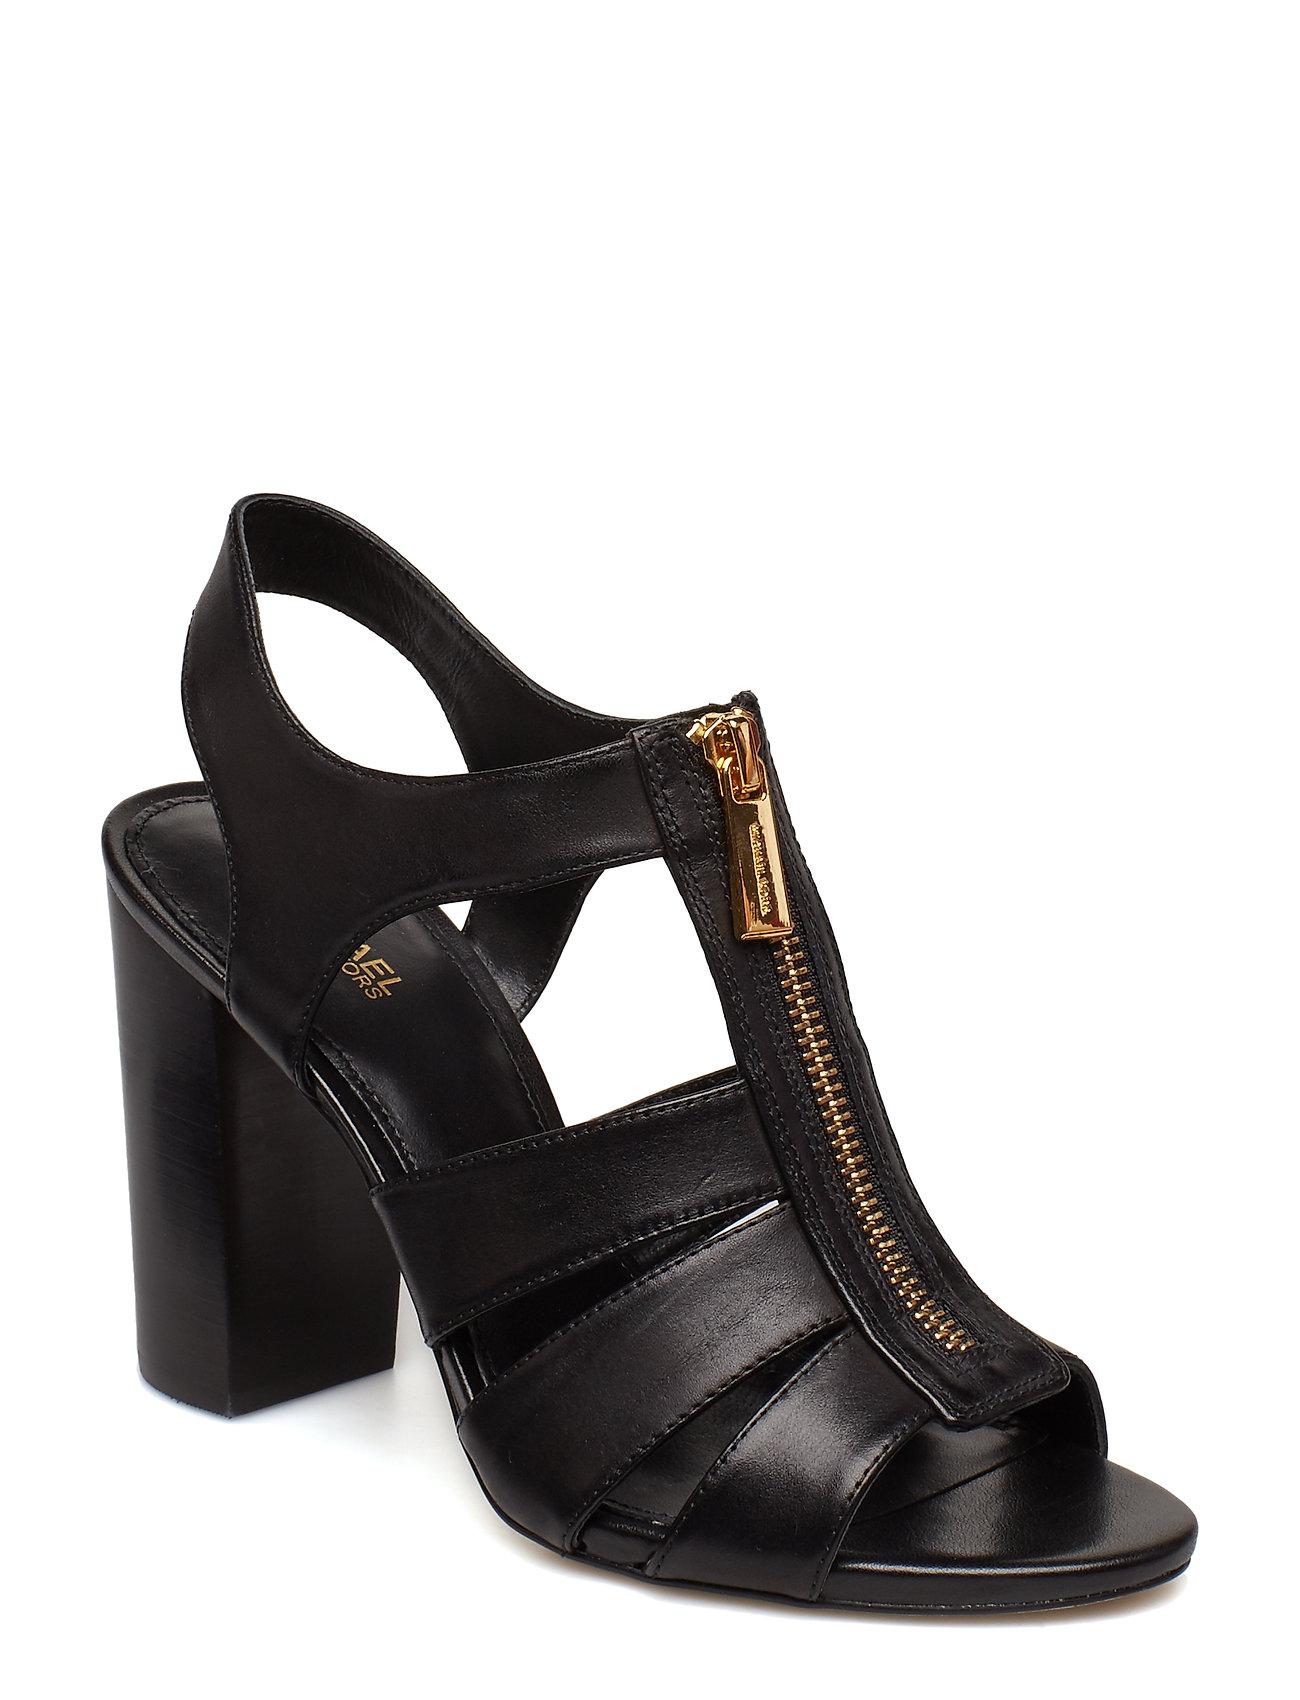 MICHAEL KORS Damita Sandal Sandale Mit Absatz Schwarz MICHAEL KORS SHOES